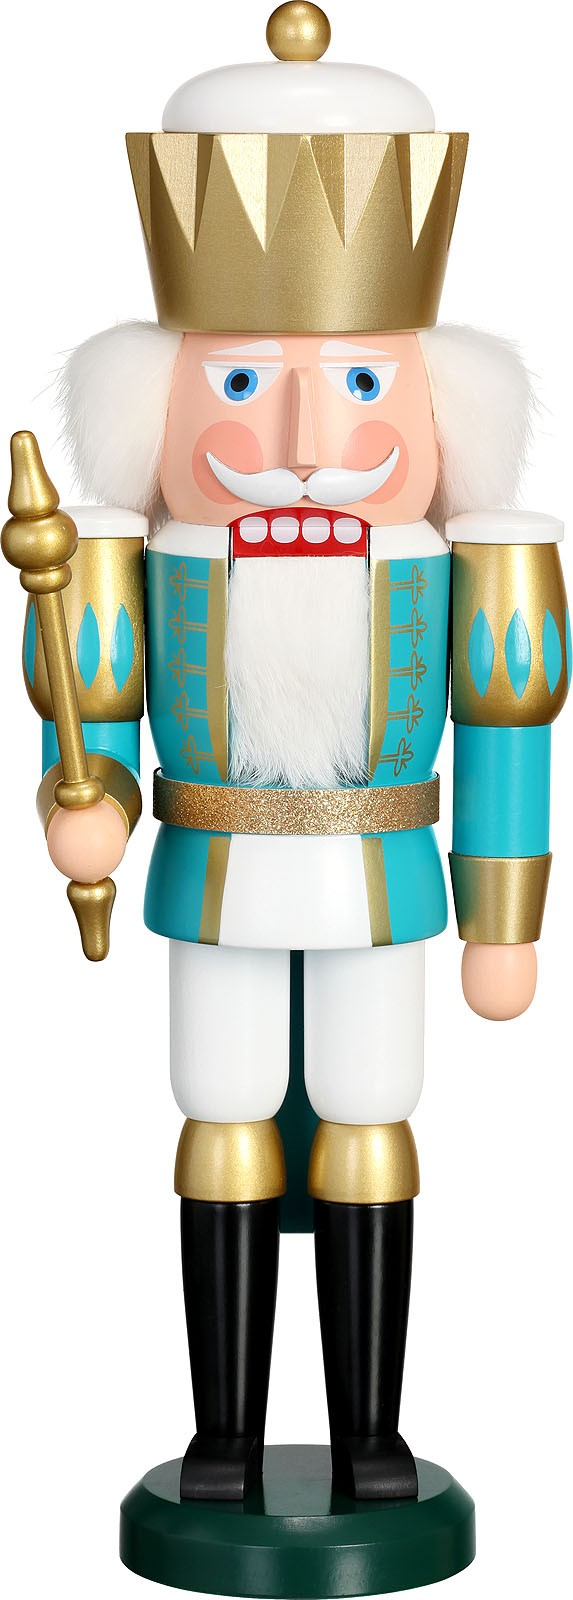 Nussknacker König, türkis-weiß